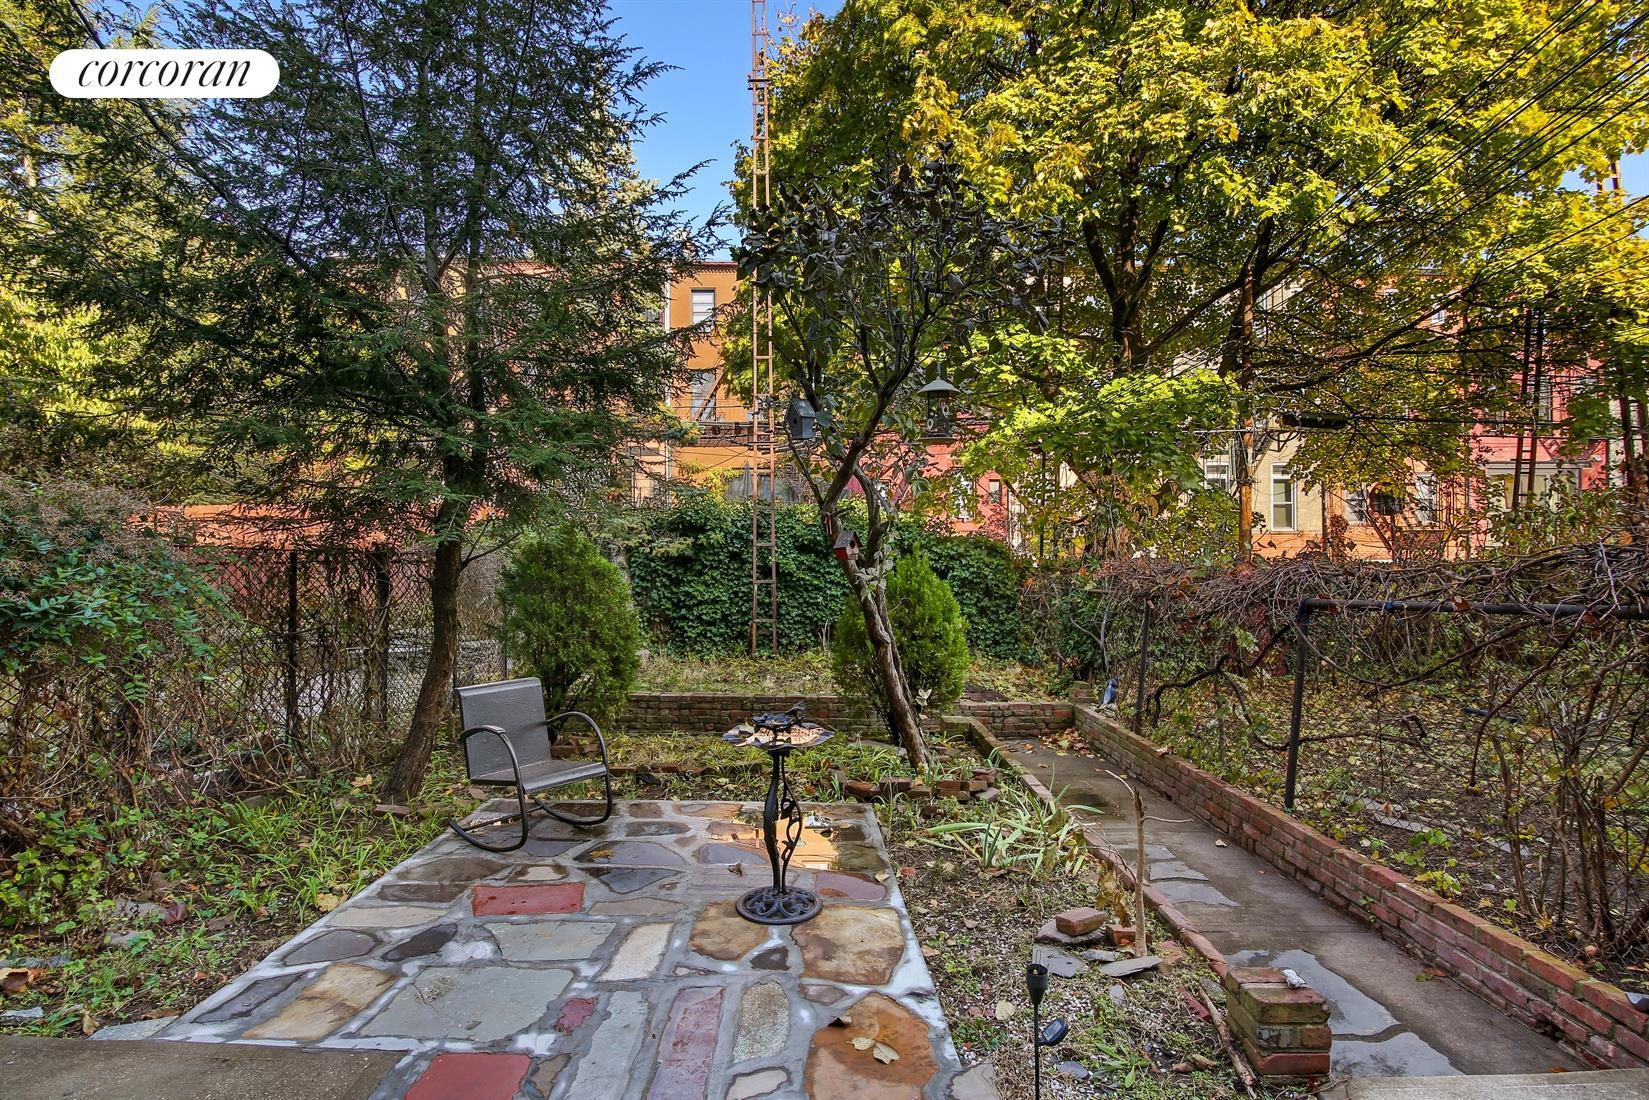 Corcoran, 259 Carroll Street, Carroll Gardens Real Estate, Brooklyn ...